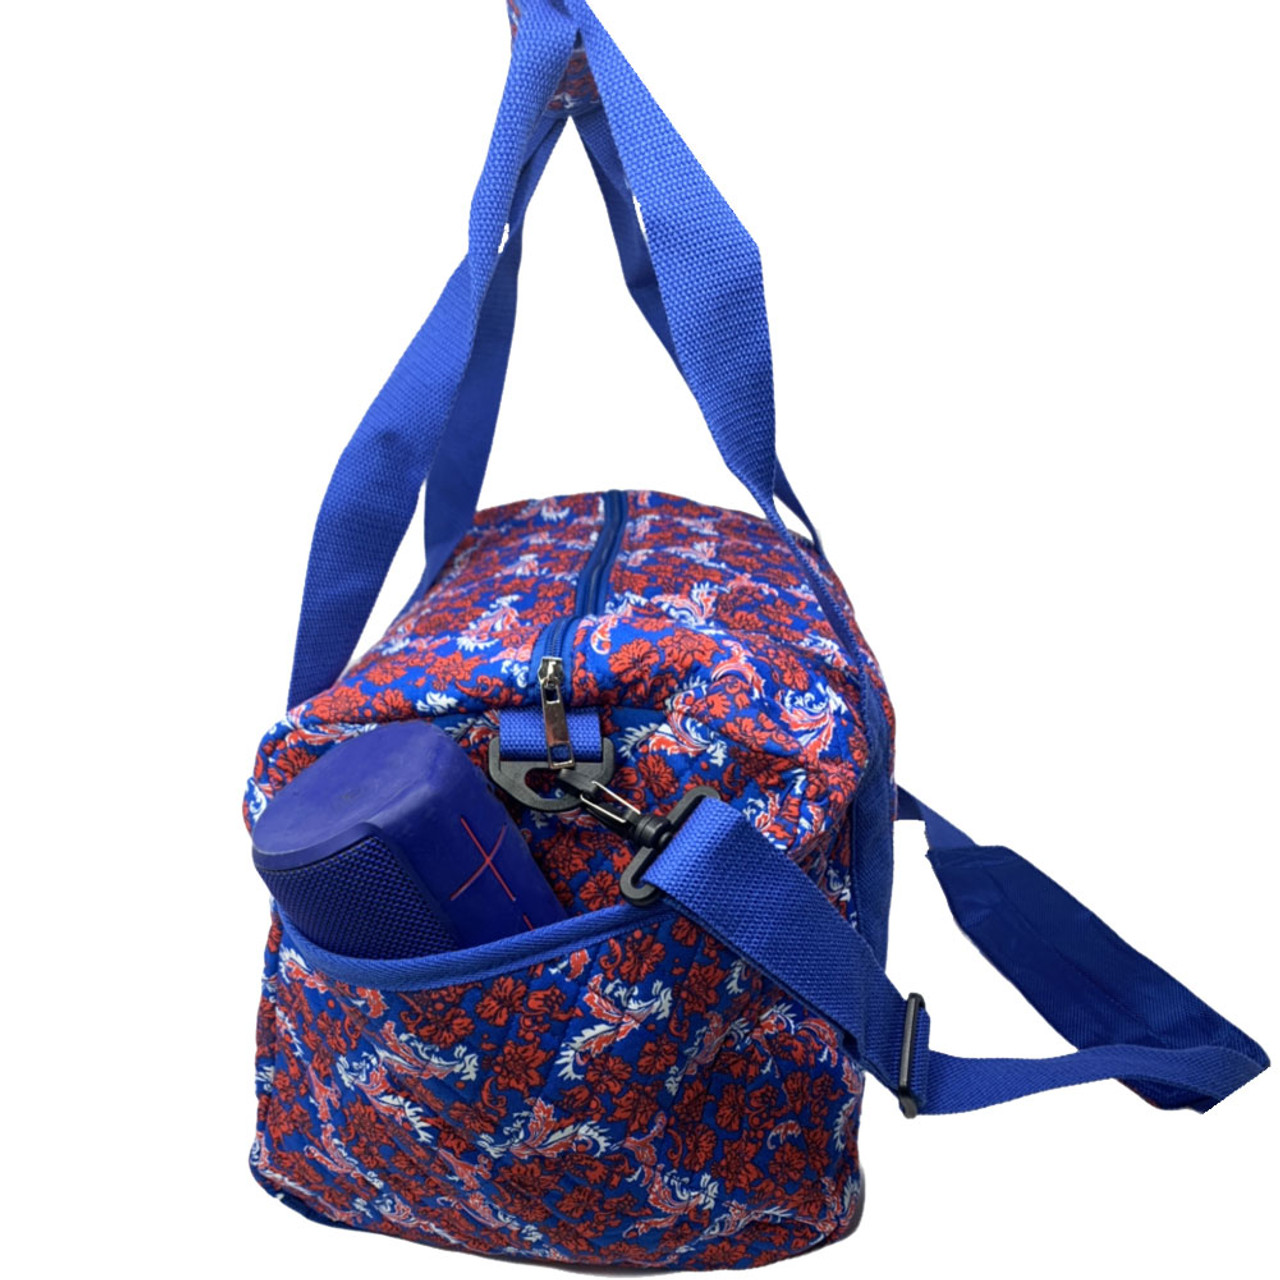 Kansas Jayhawks KU Duffel Bag Bloom Quilted Mini Travel Bag